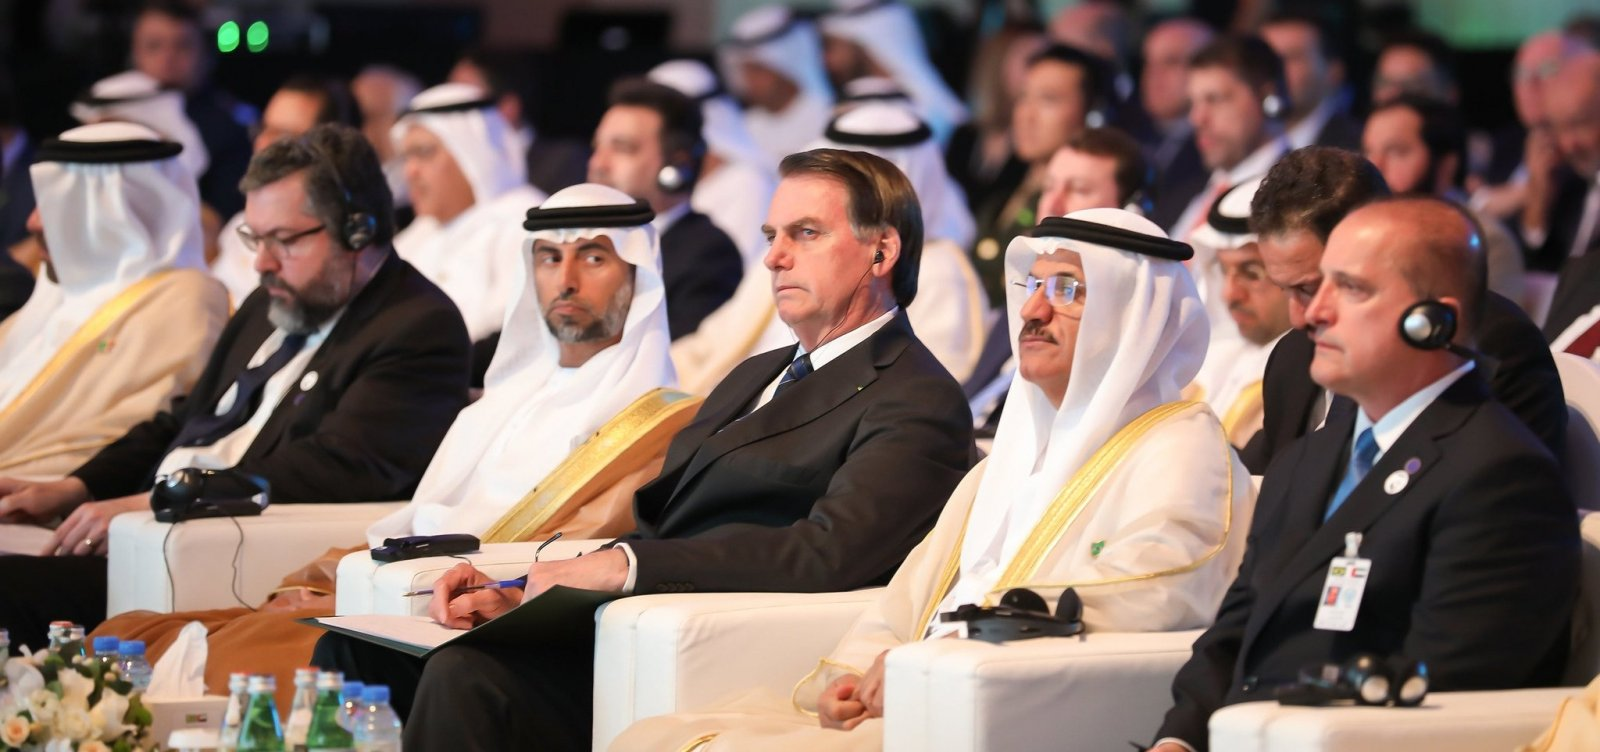 [Bolsonaro e xeique dos Emirados Árabes assinam acordo de comércio]